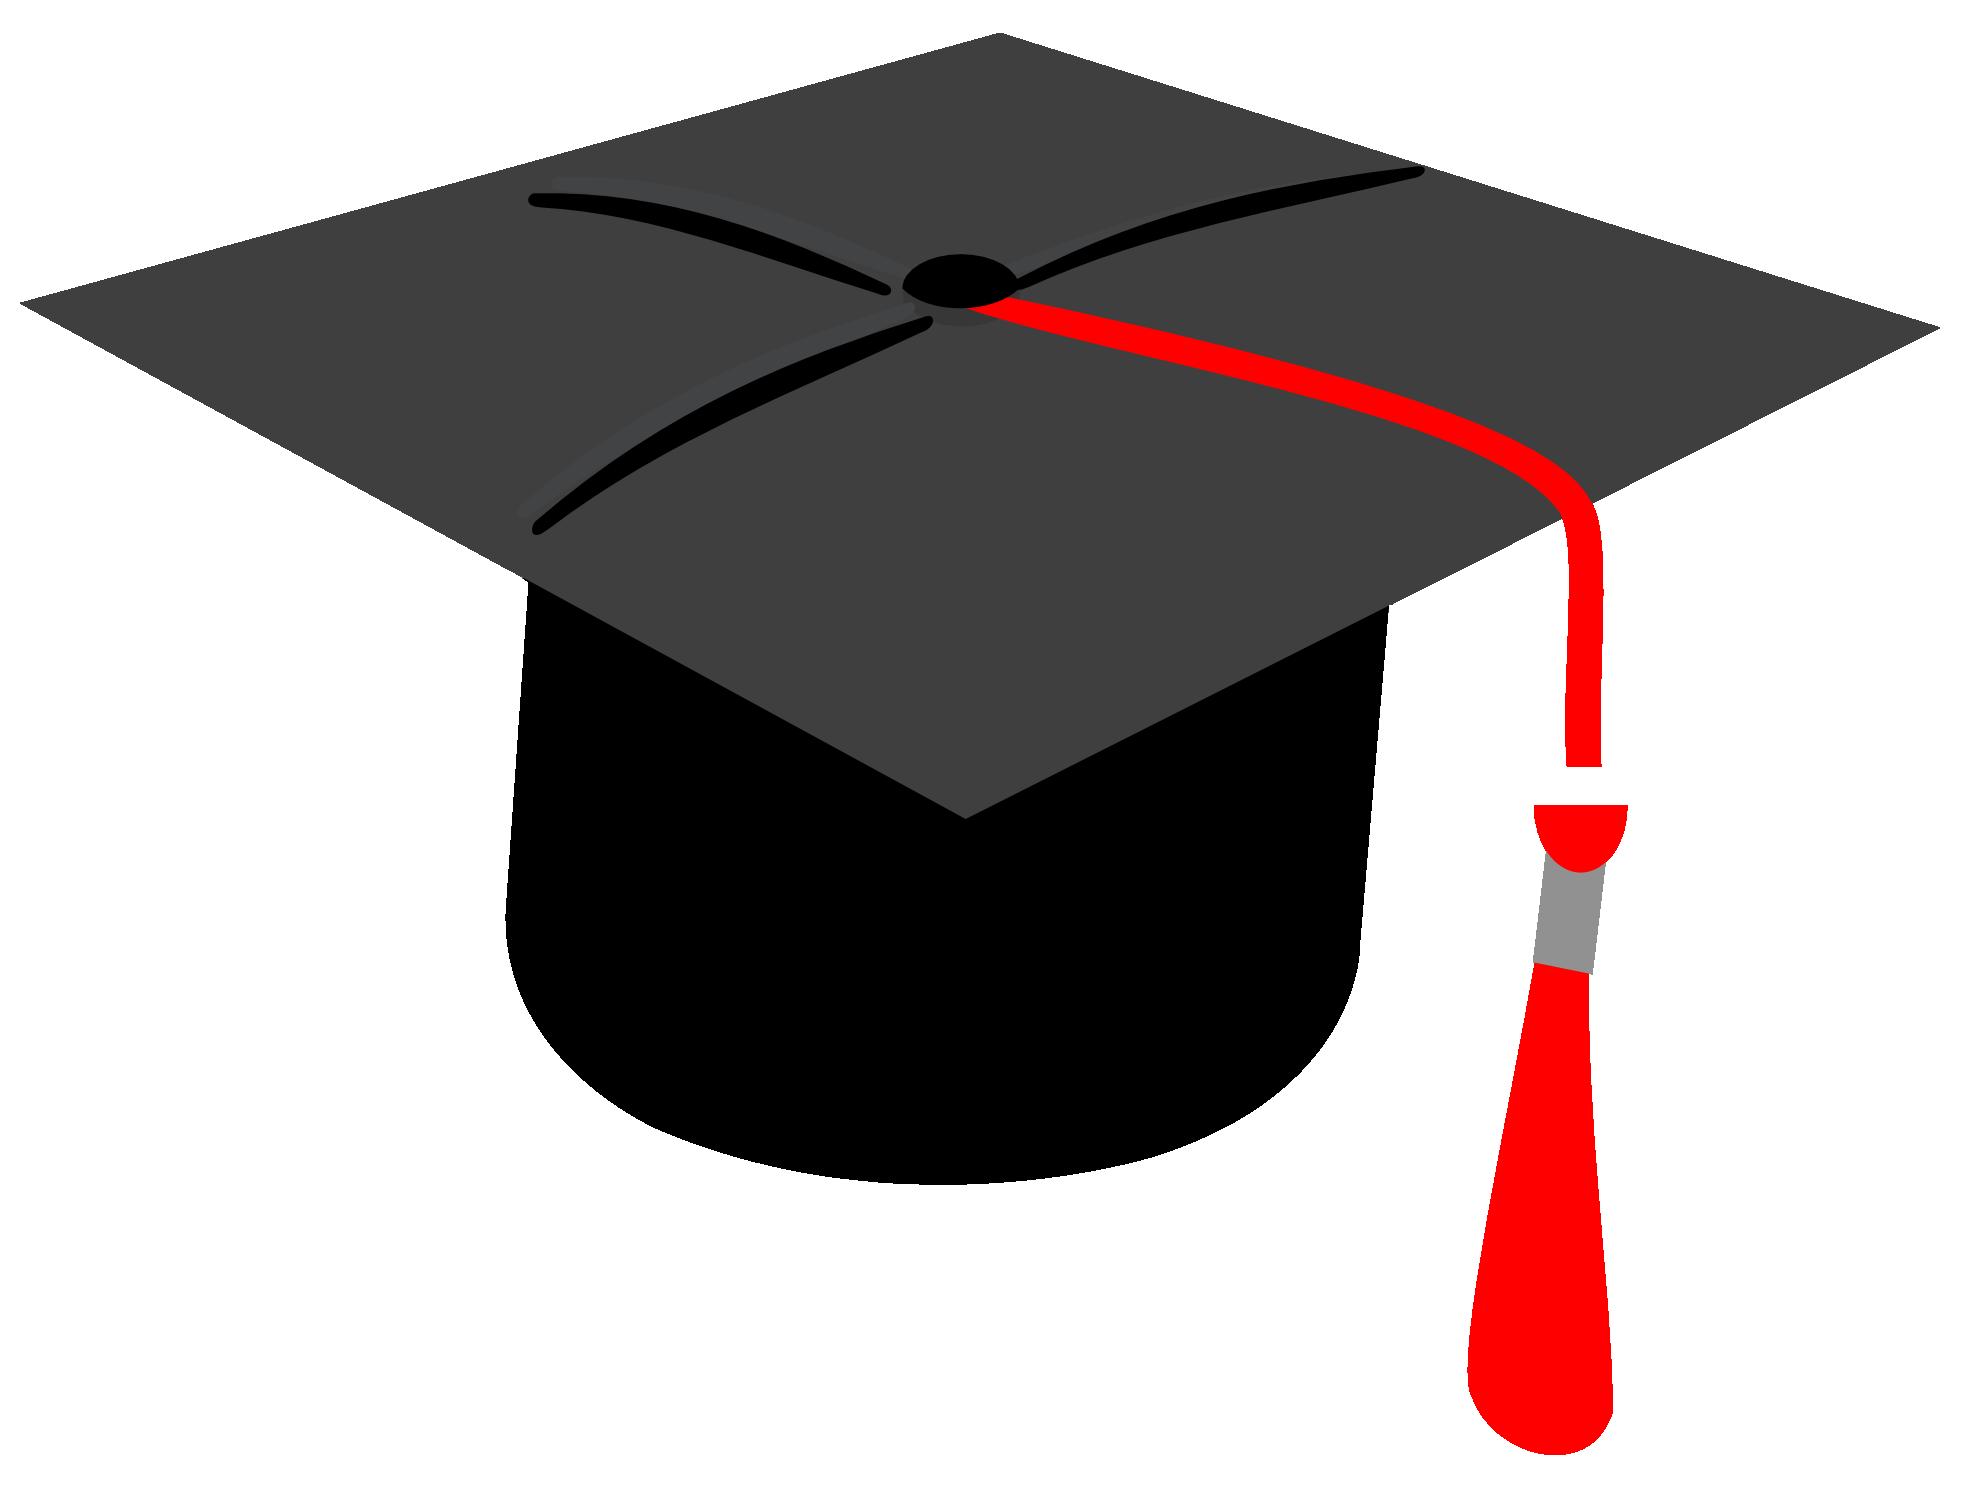 Graduation cap png image. Diploma clipart transparent background